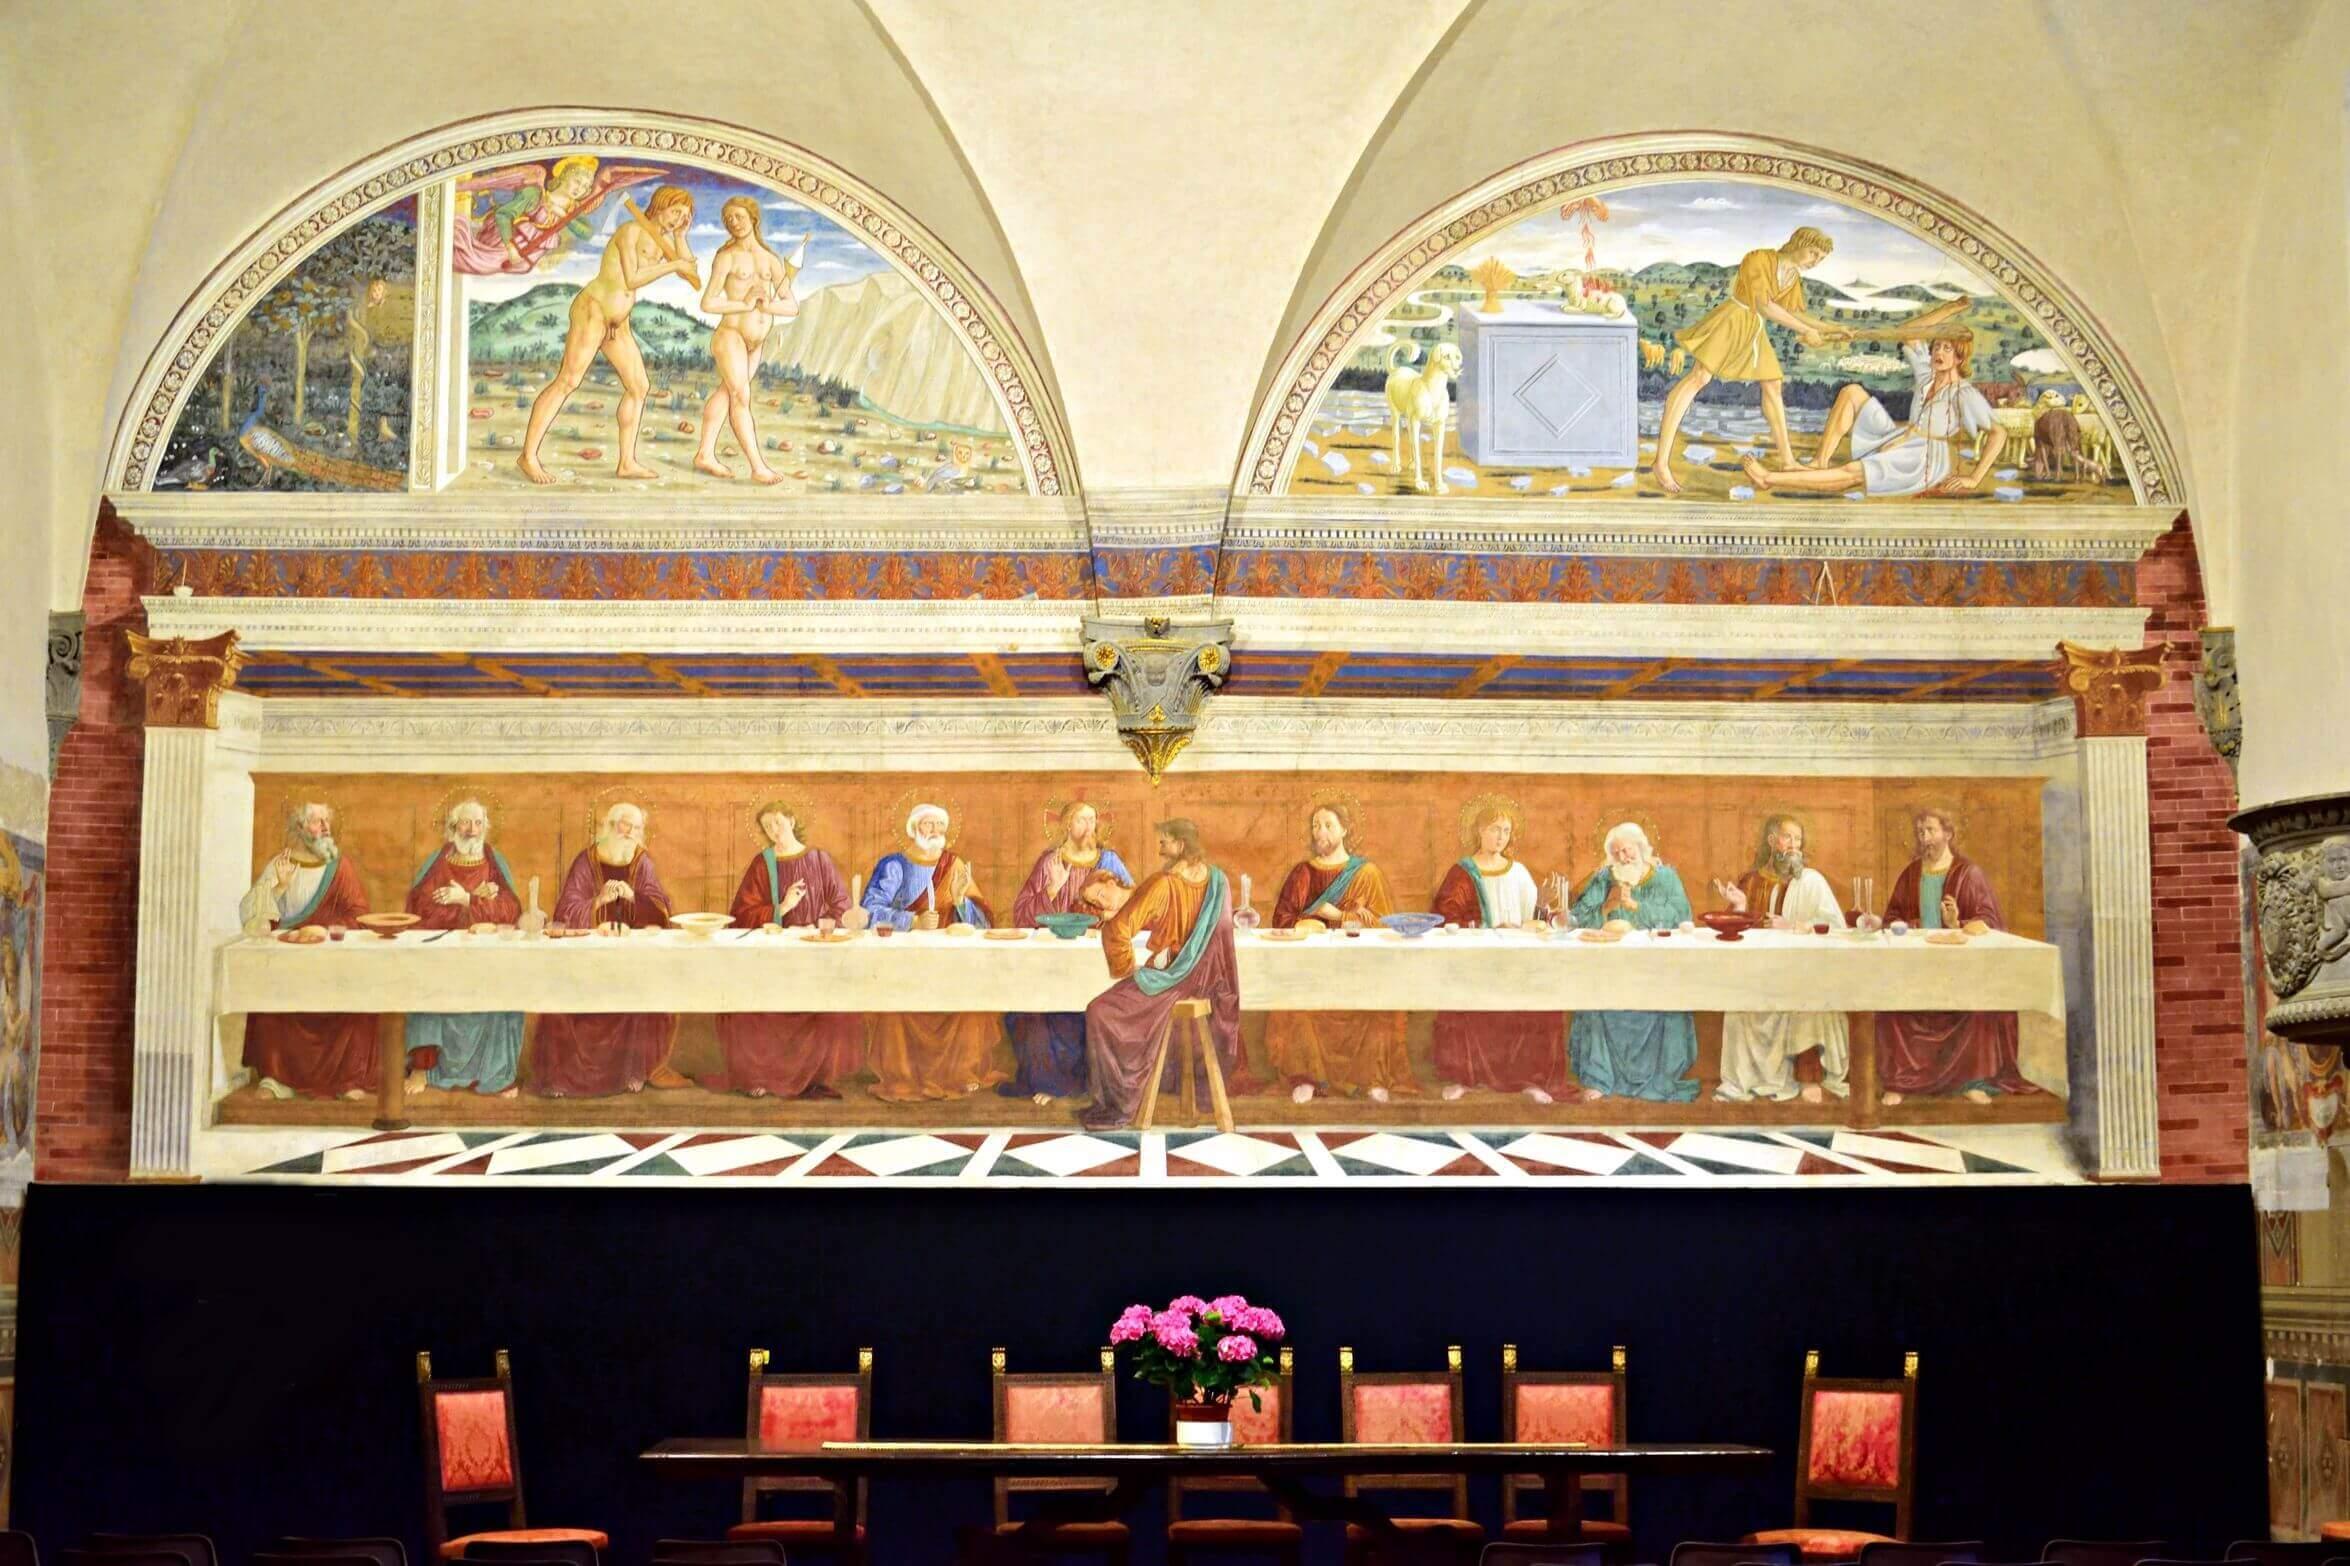 05-VisitChianti-Ultima-cena-ghirlandaio-Badia a Passignano-chianti-toscana-2350x1566